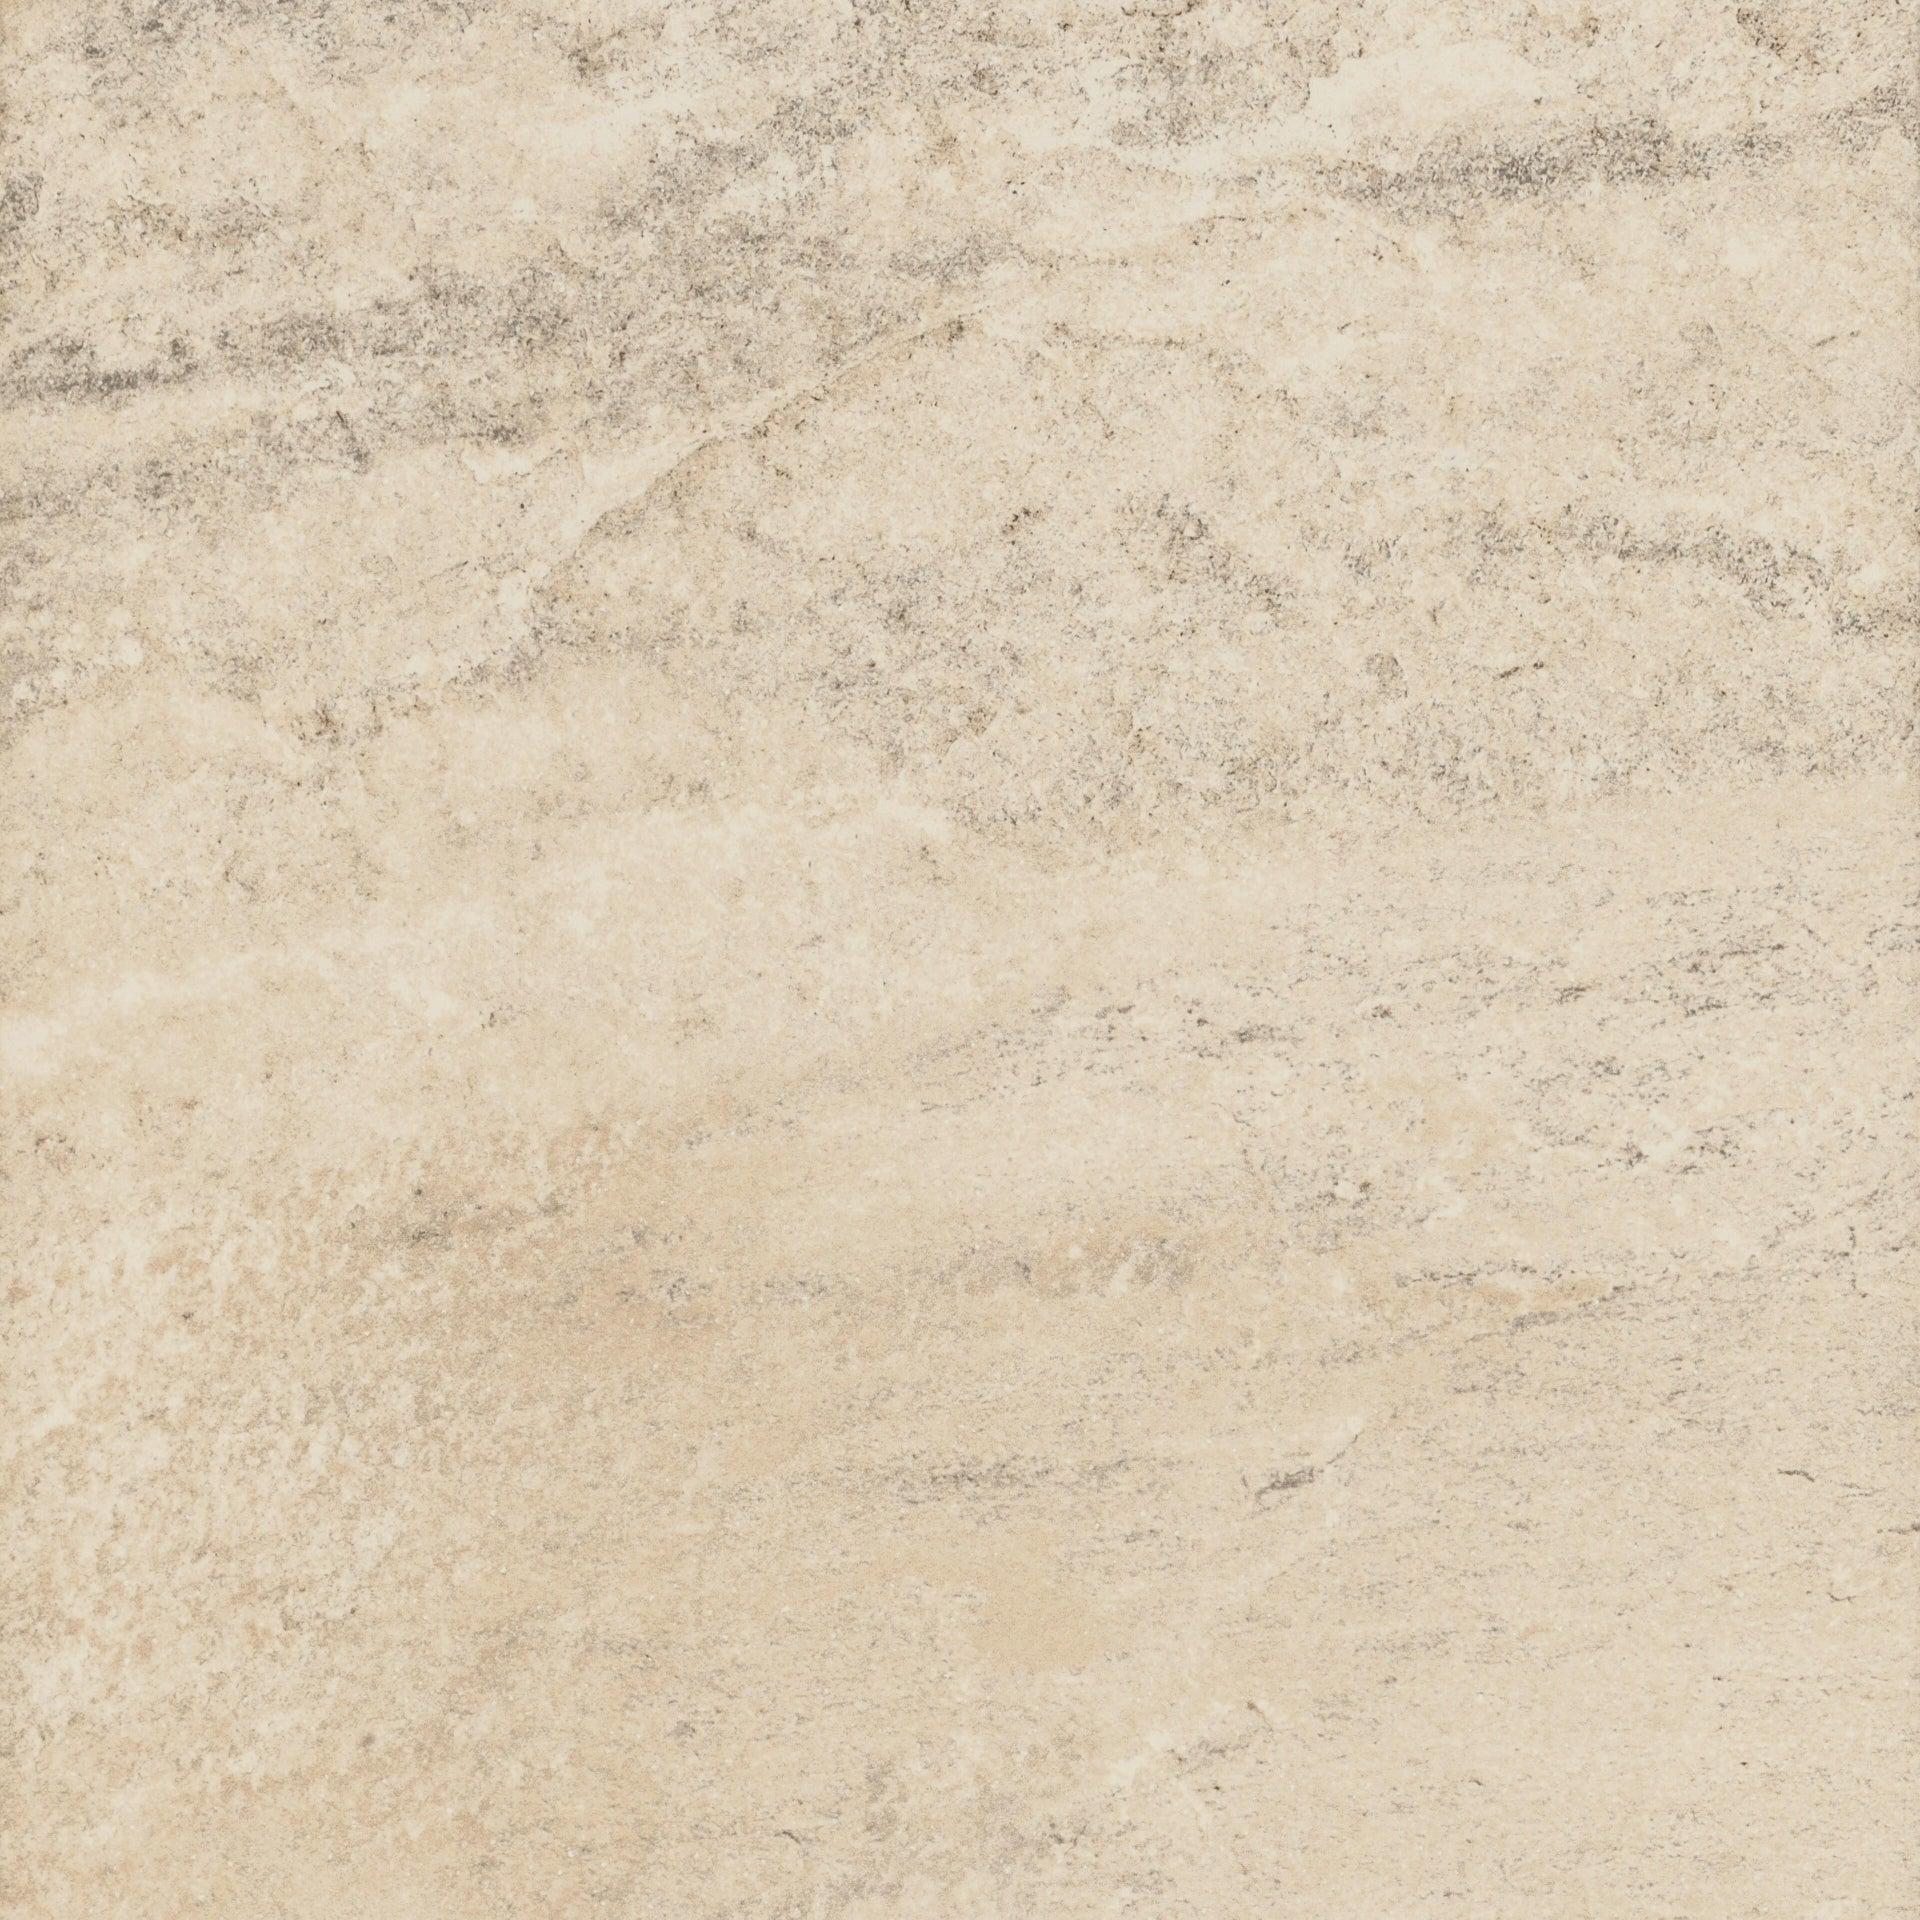 Piastrella da pavimento Walk 32.5 x 32.5 cm sp. 9 mm PEI 3/5 beige - 7